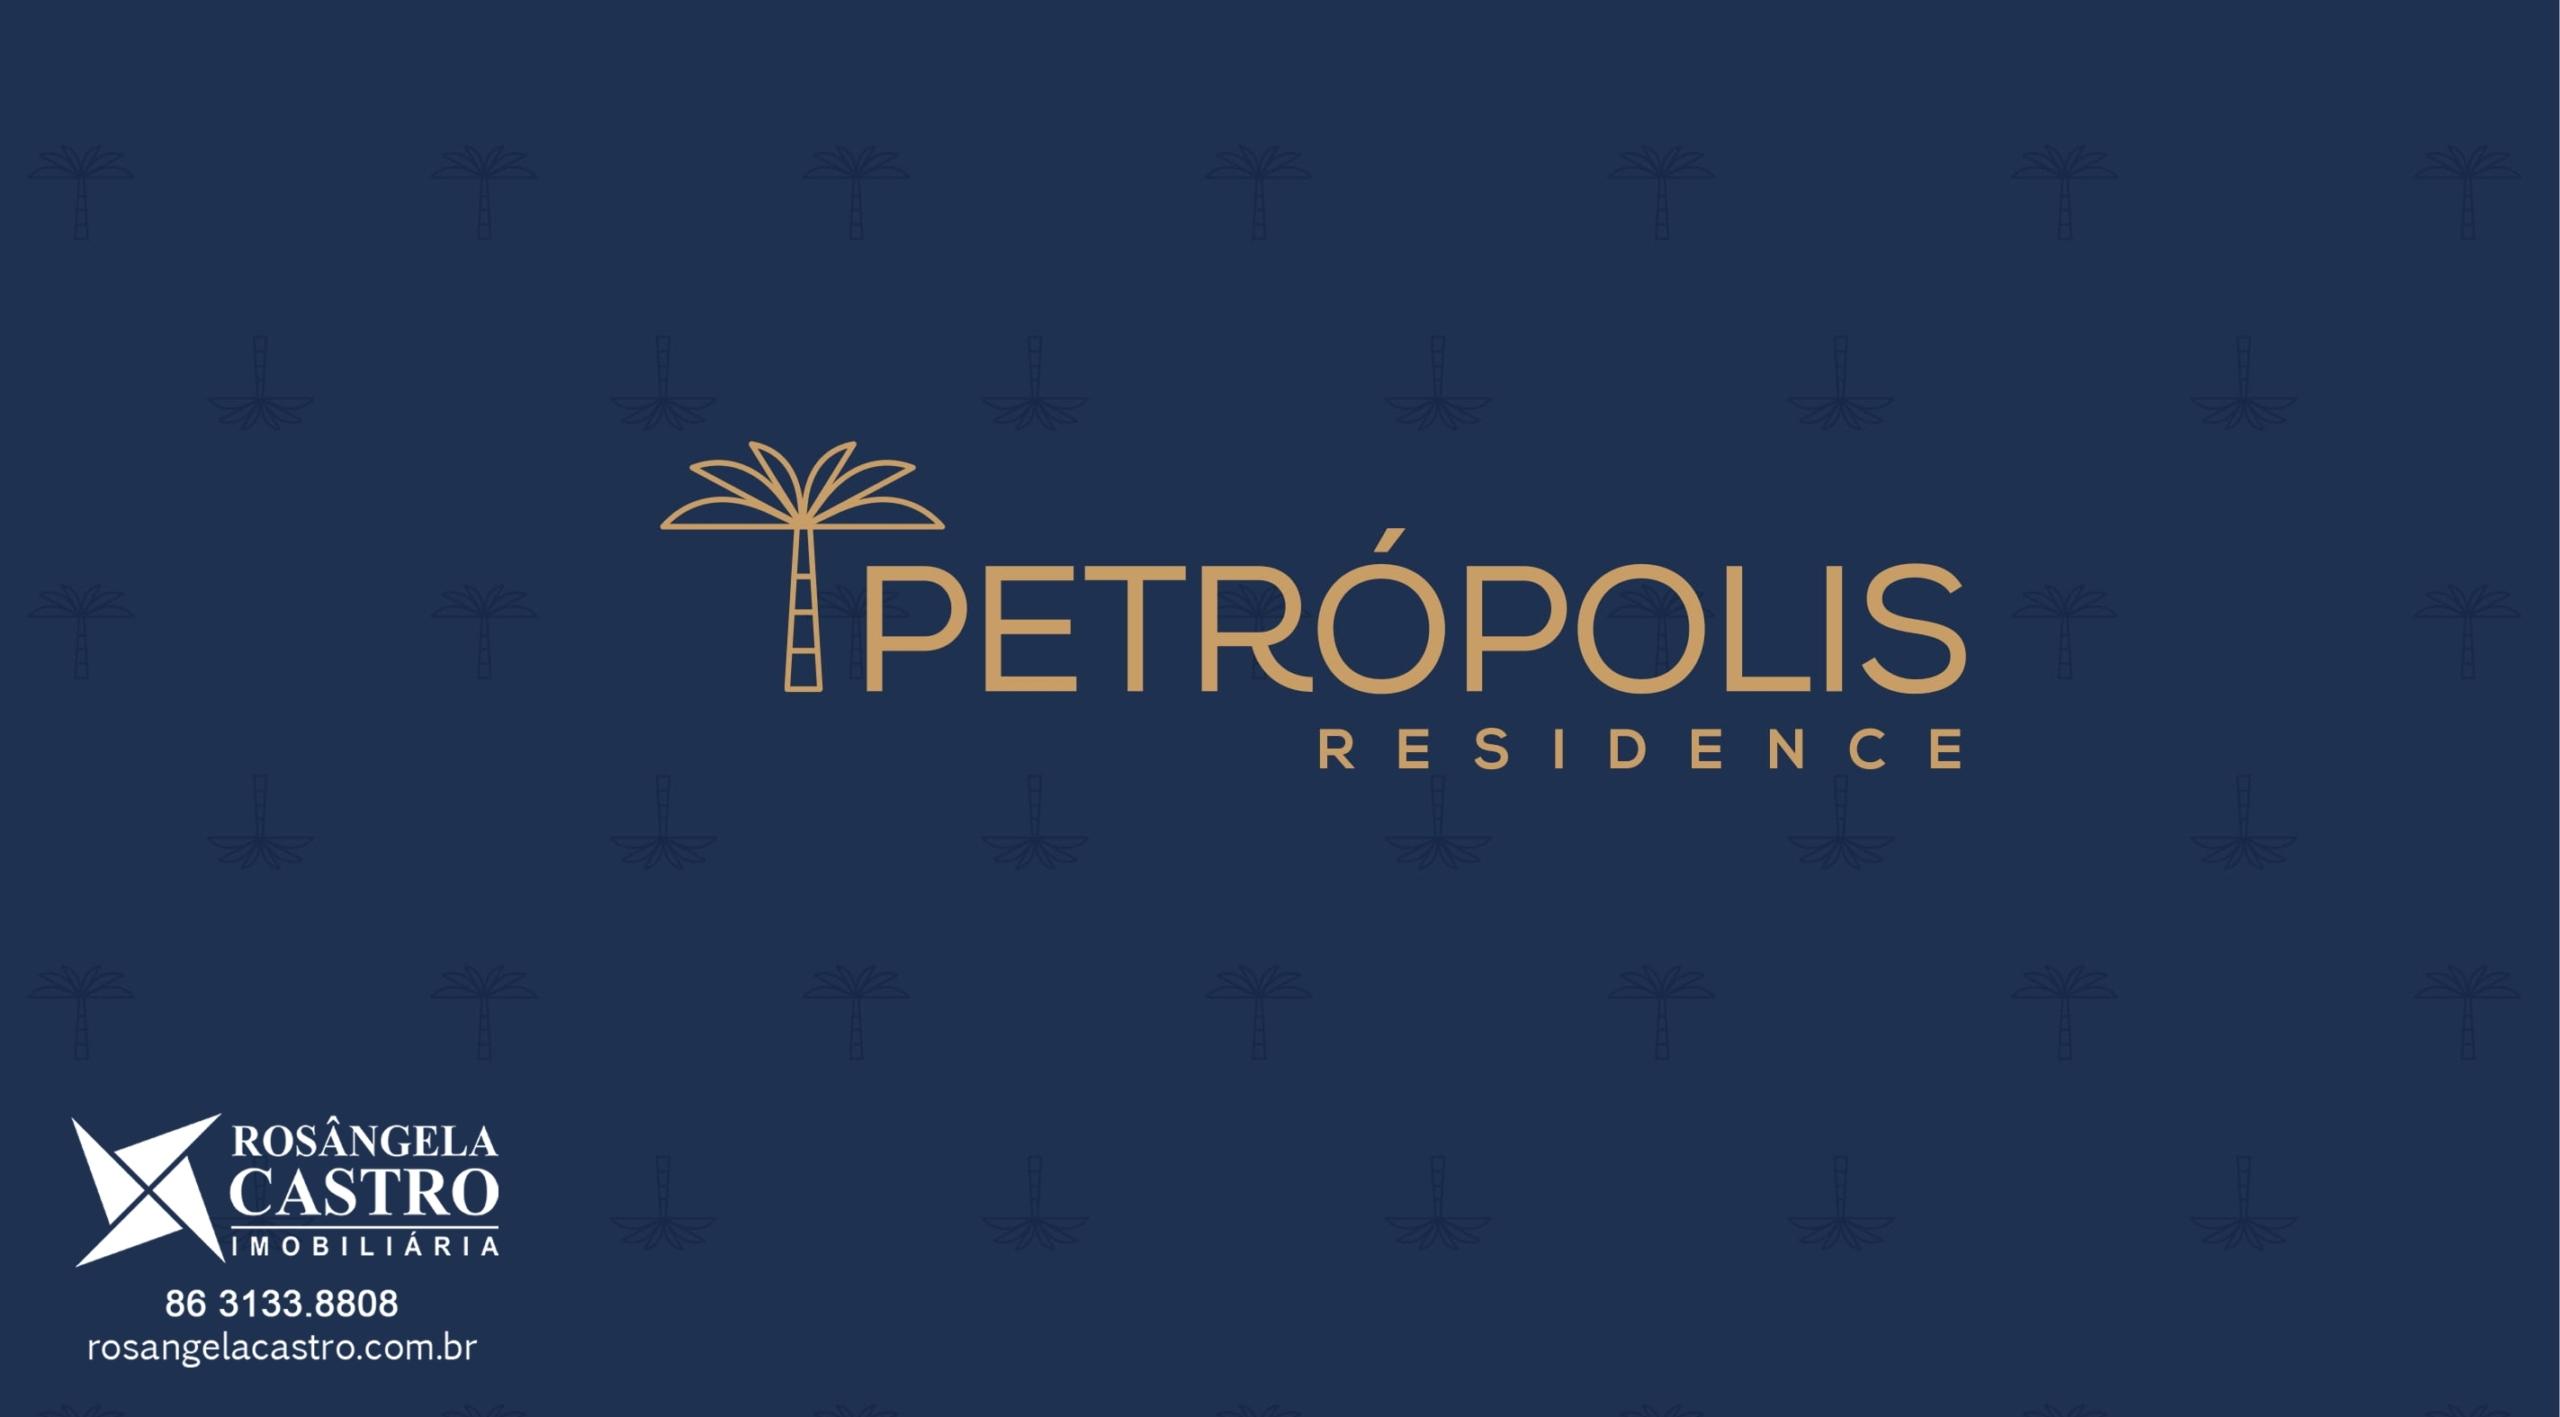 Petrópolis Residence Tereisna-PI